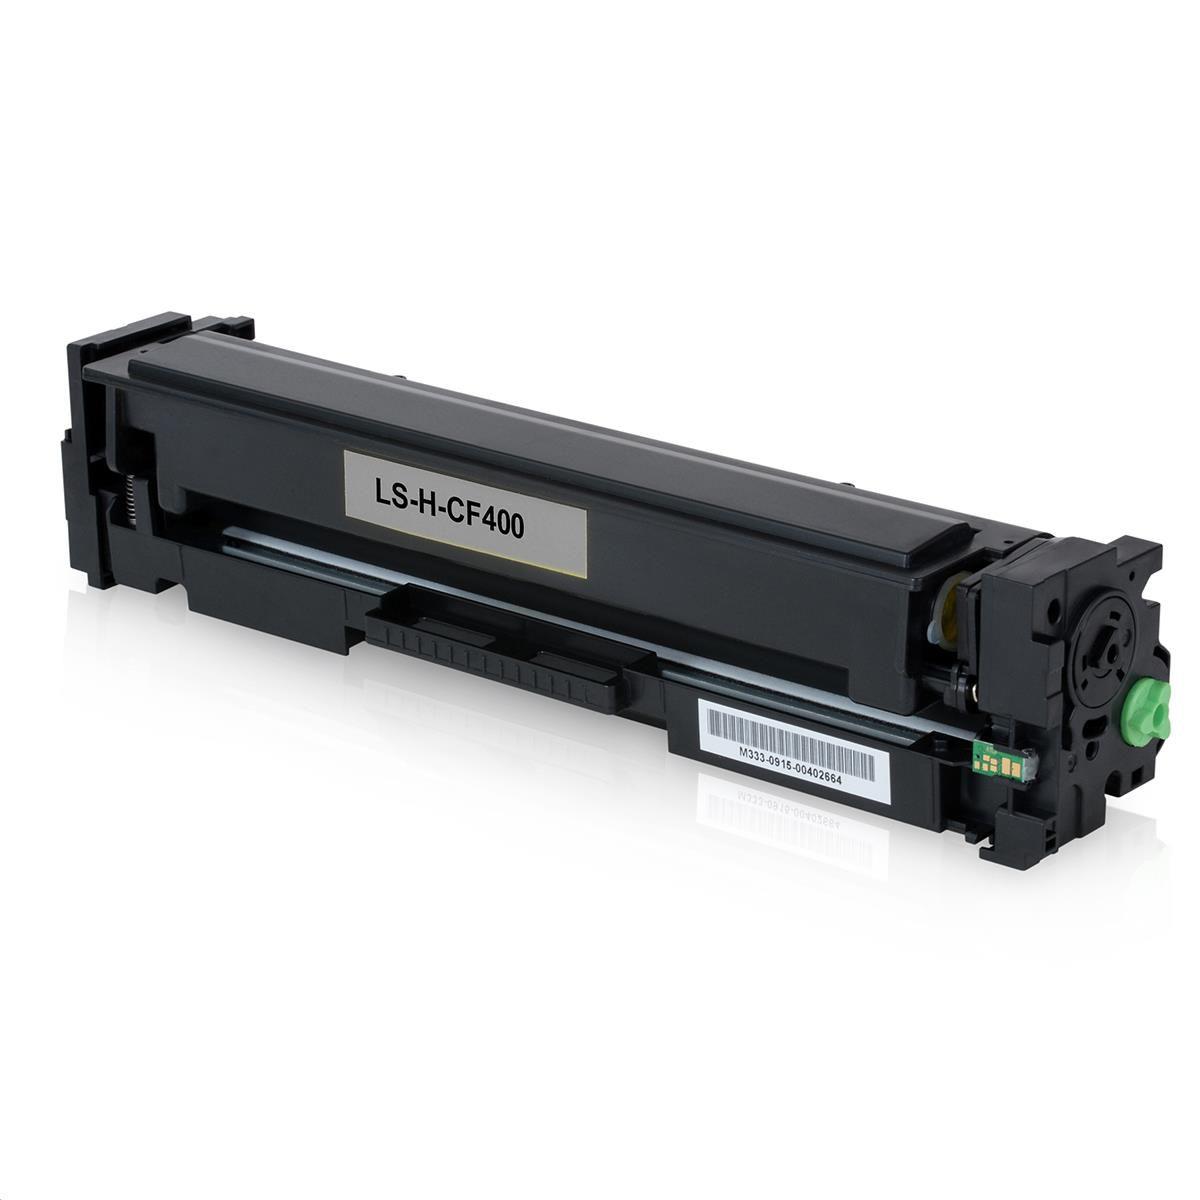 TONER HP CF 400A BK 1.5K - (M252DW/M274N/M277DW) - COLORTEK